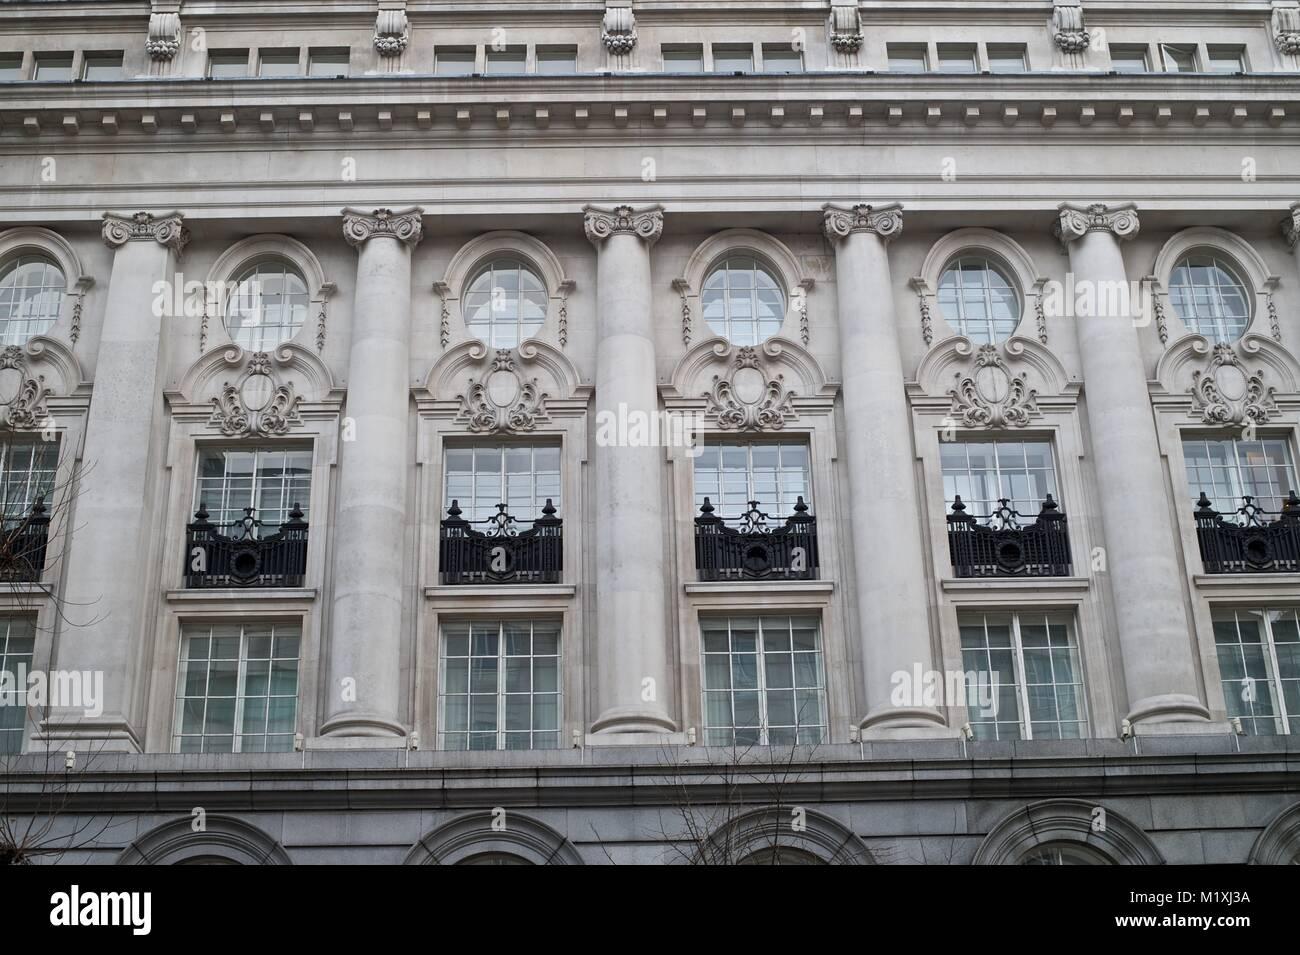 Hotel, Rosewood, Holborn London - Stock Image